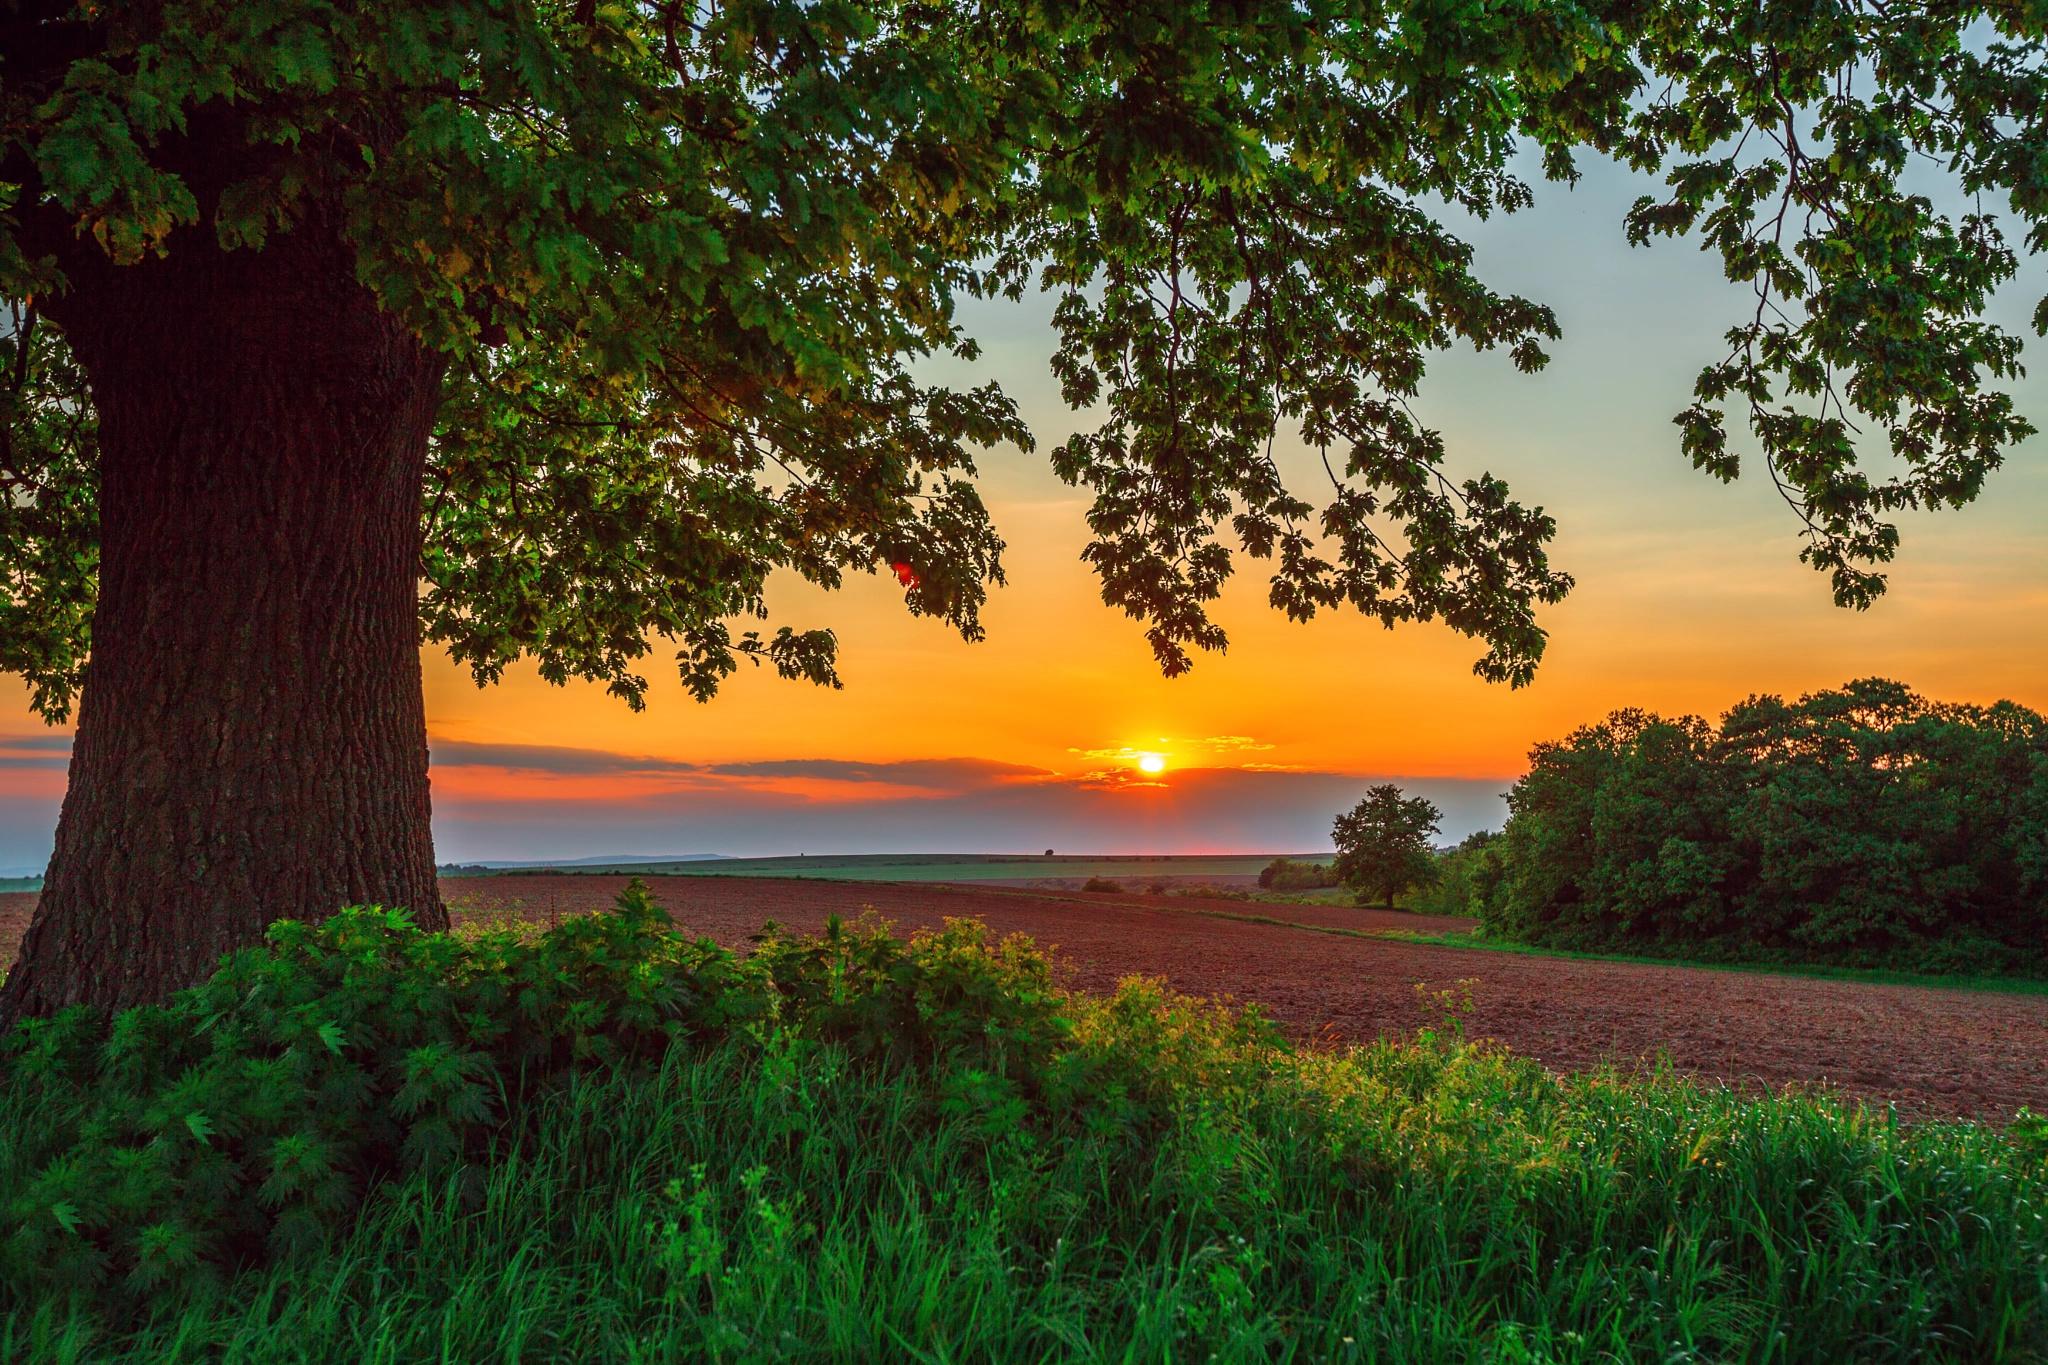 Wallpaper Sunset Nature Road Plants Big Tree Clouds